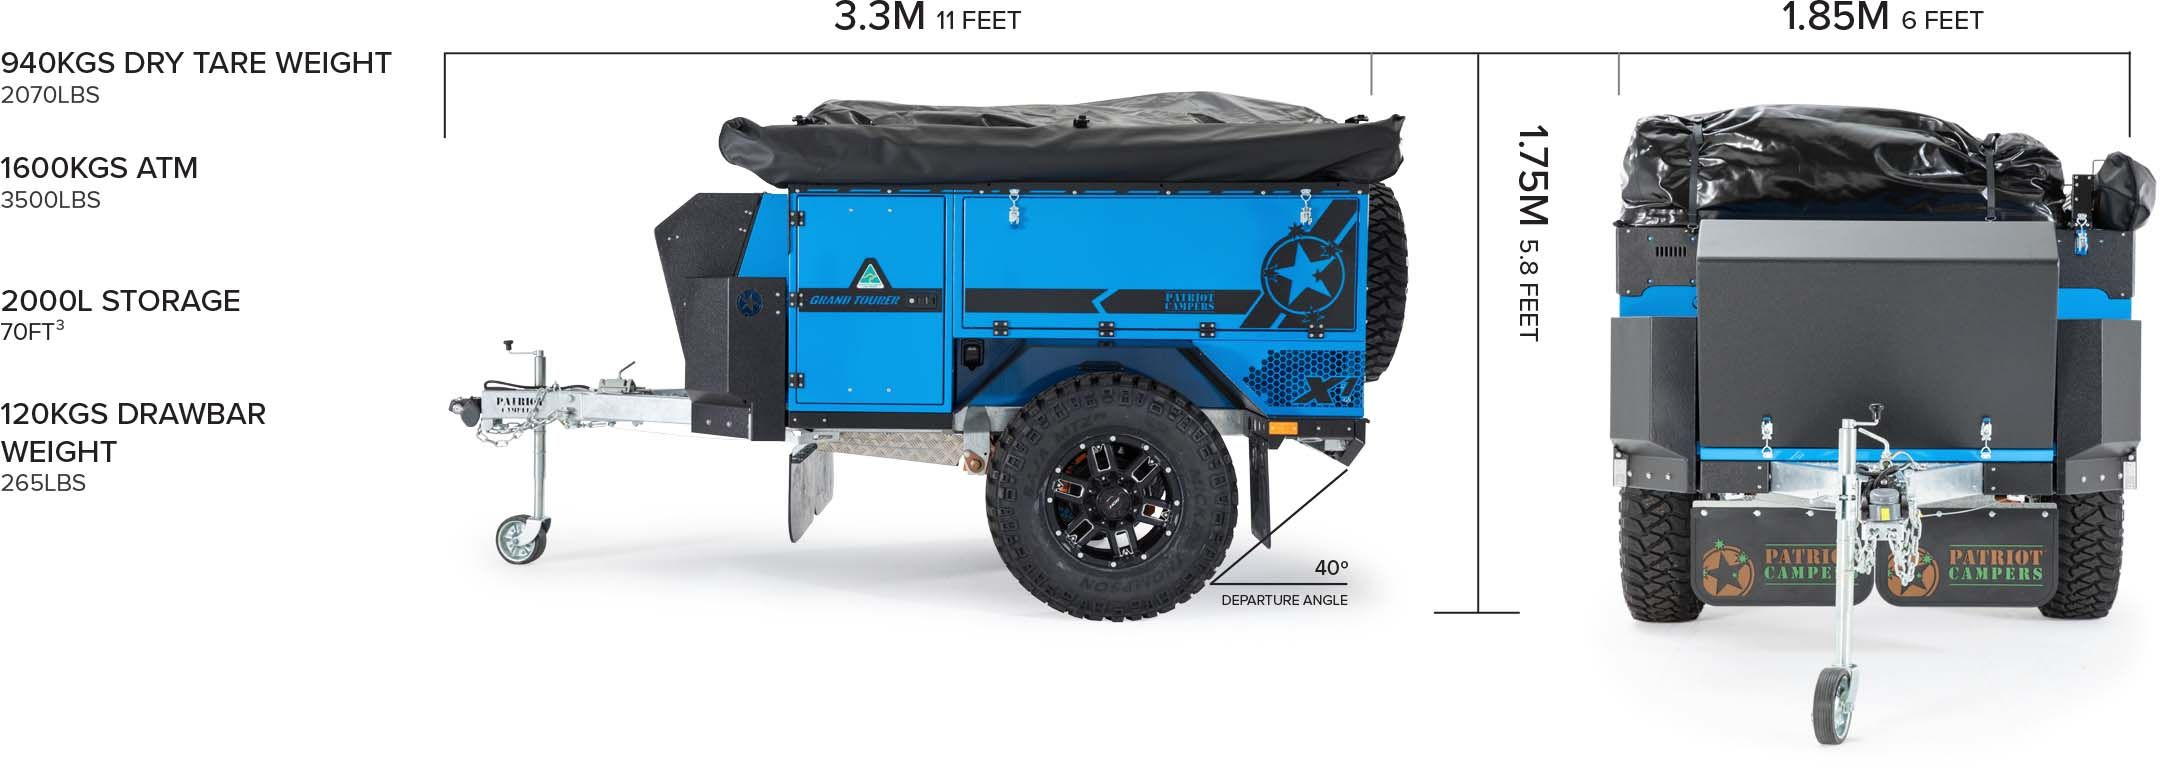 Patriot Campers X1 Standard Edition Camper Trailer Vehicles Jeep Wrangler Remolques De Campamento Autocaravana